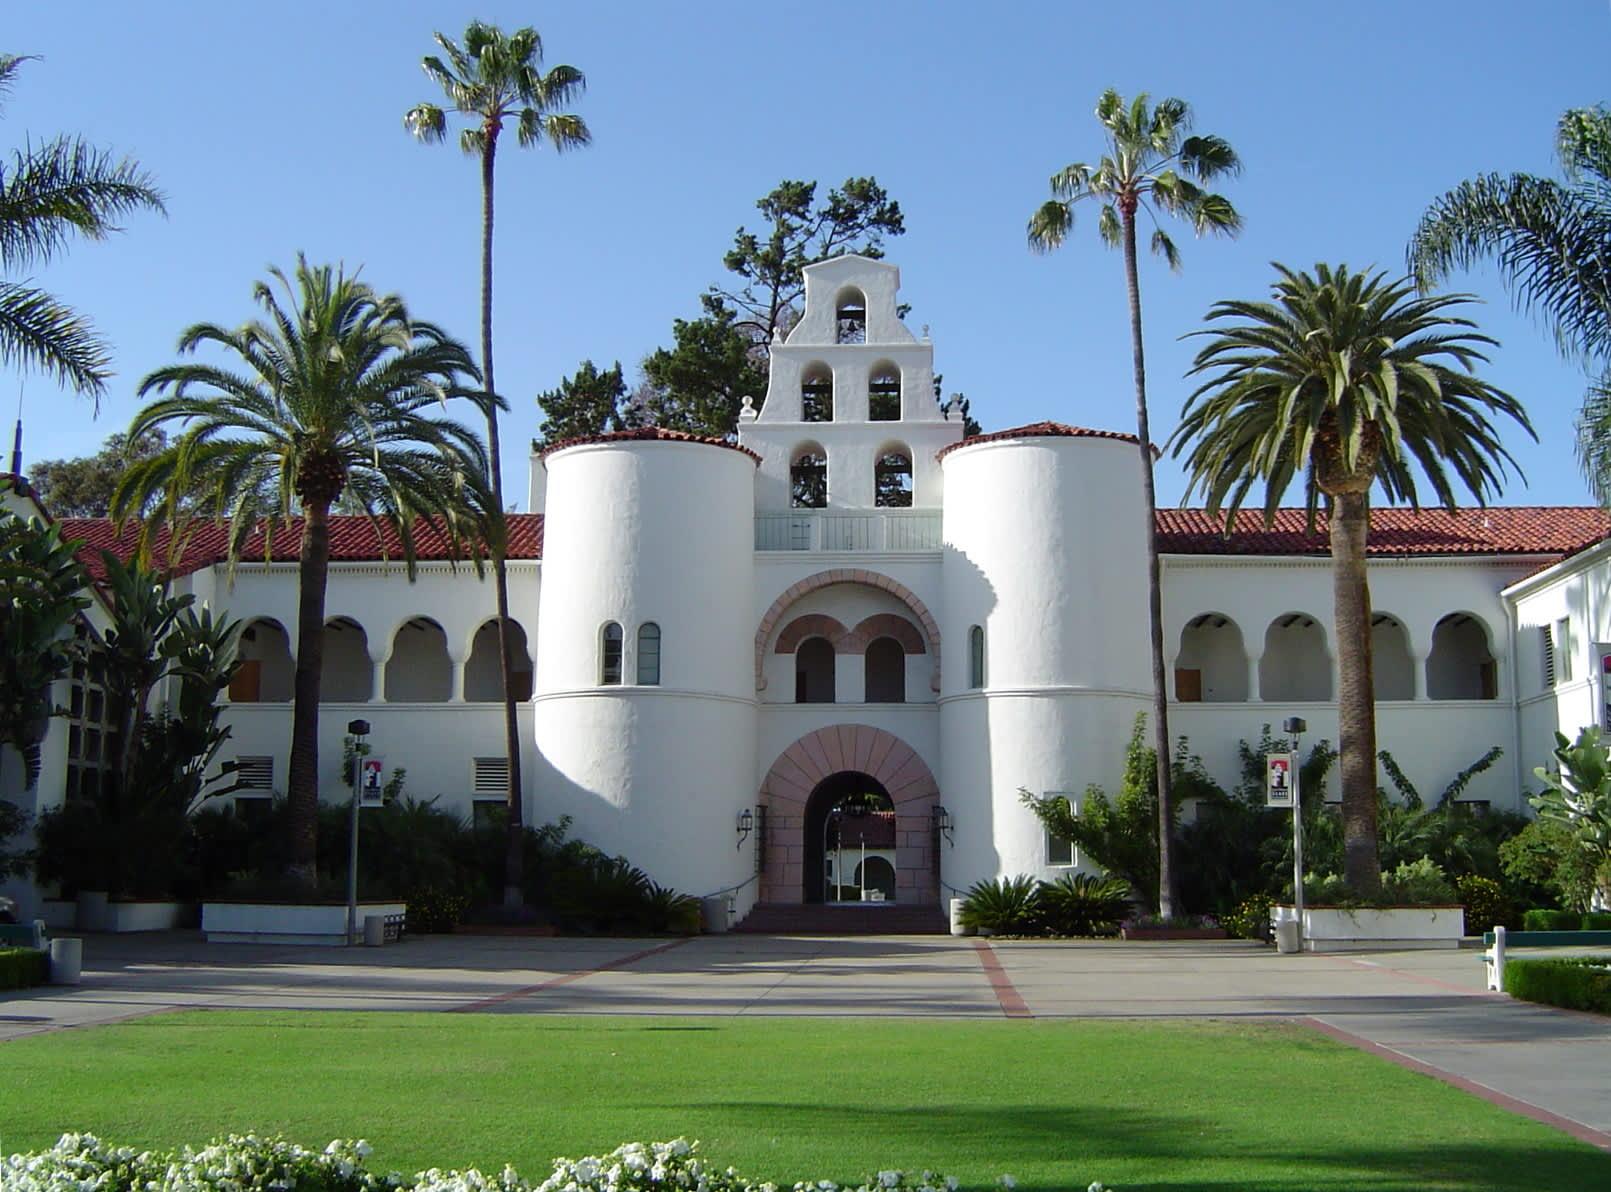 CC: San Diego State University